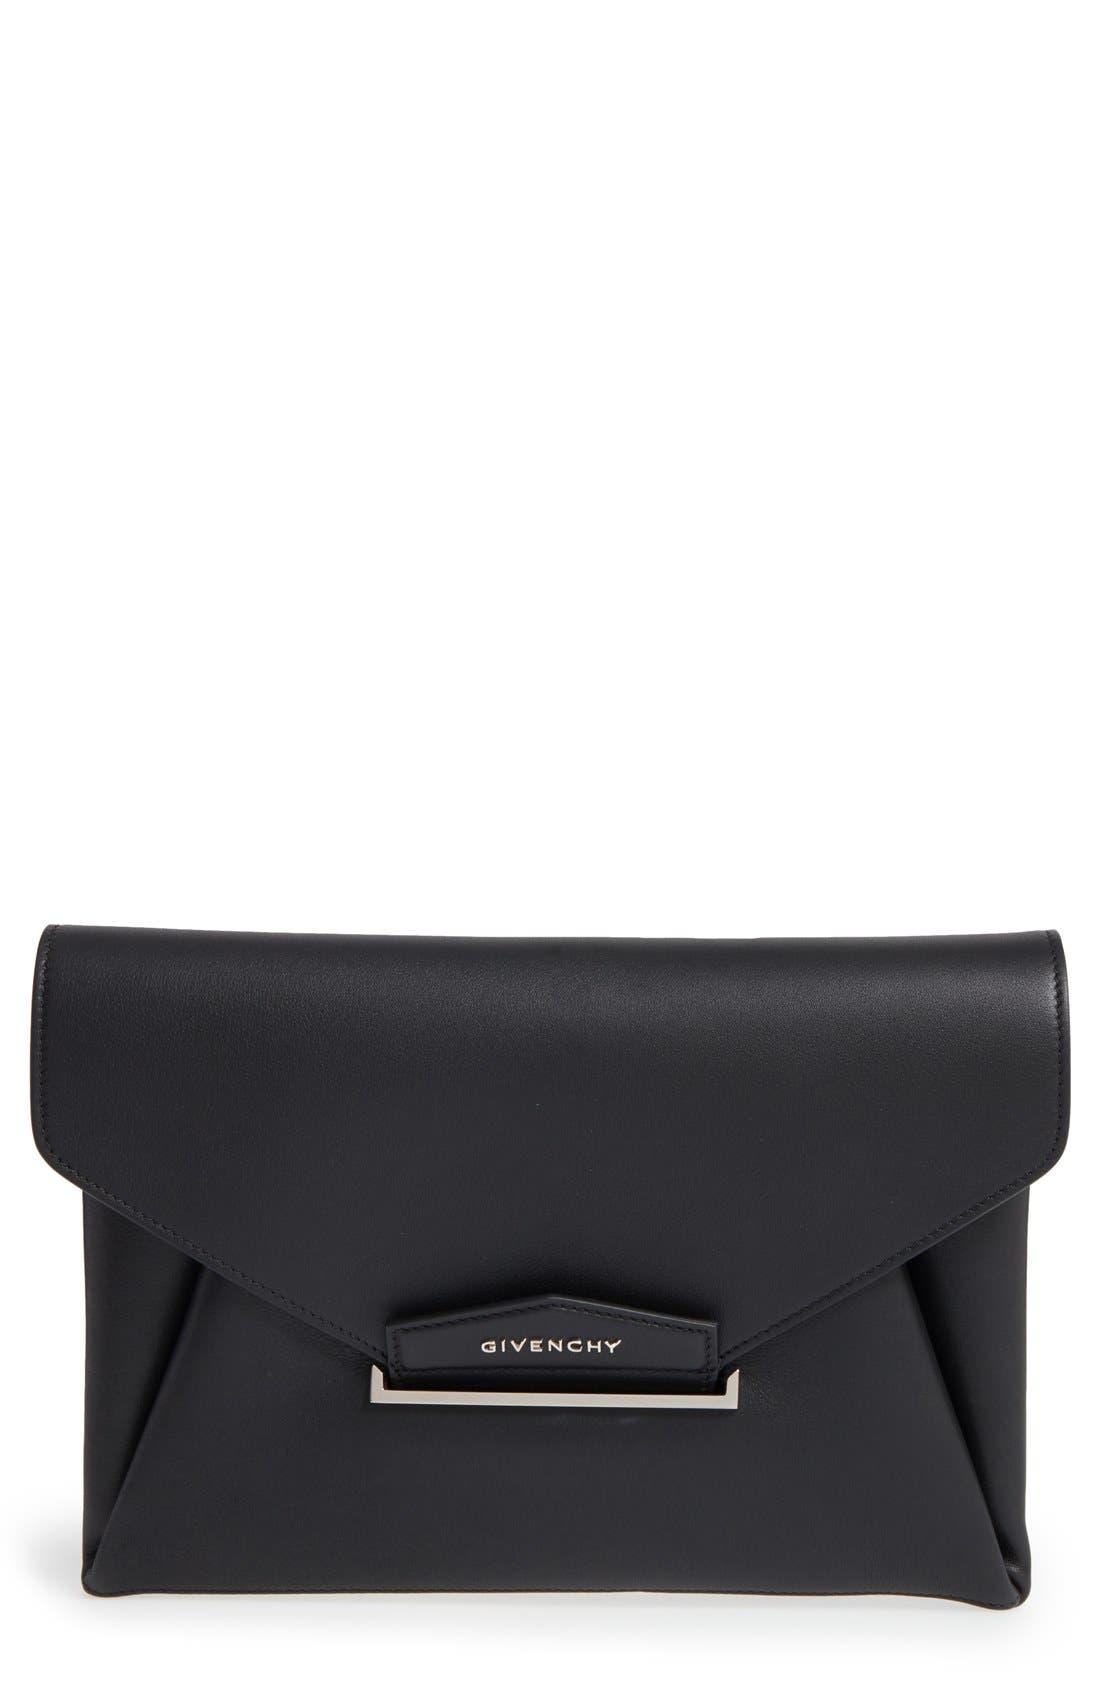 Alternate Image 1 Selected - Givenchy 'Medium Antigona' Leather Envelope Clutch